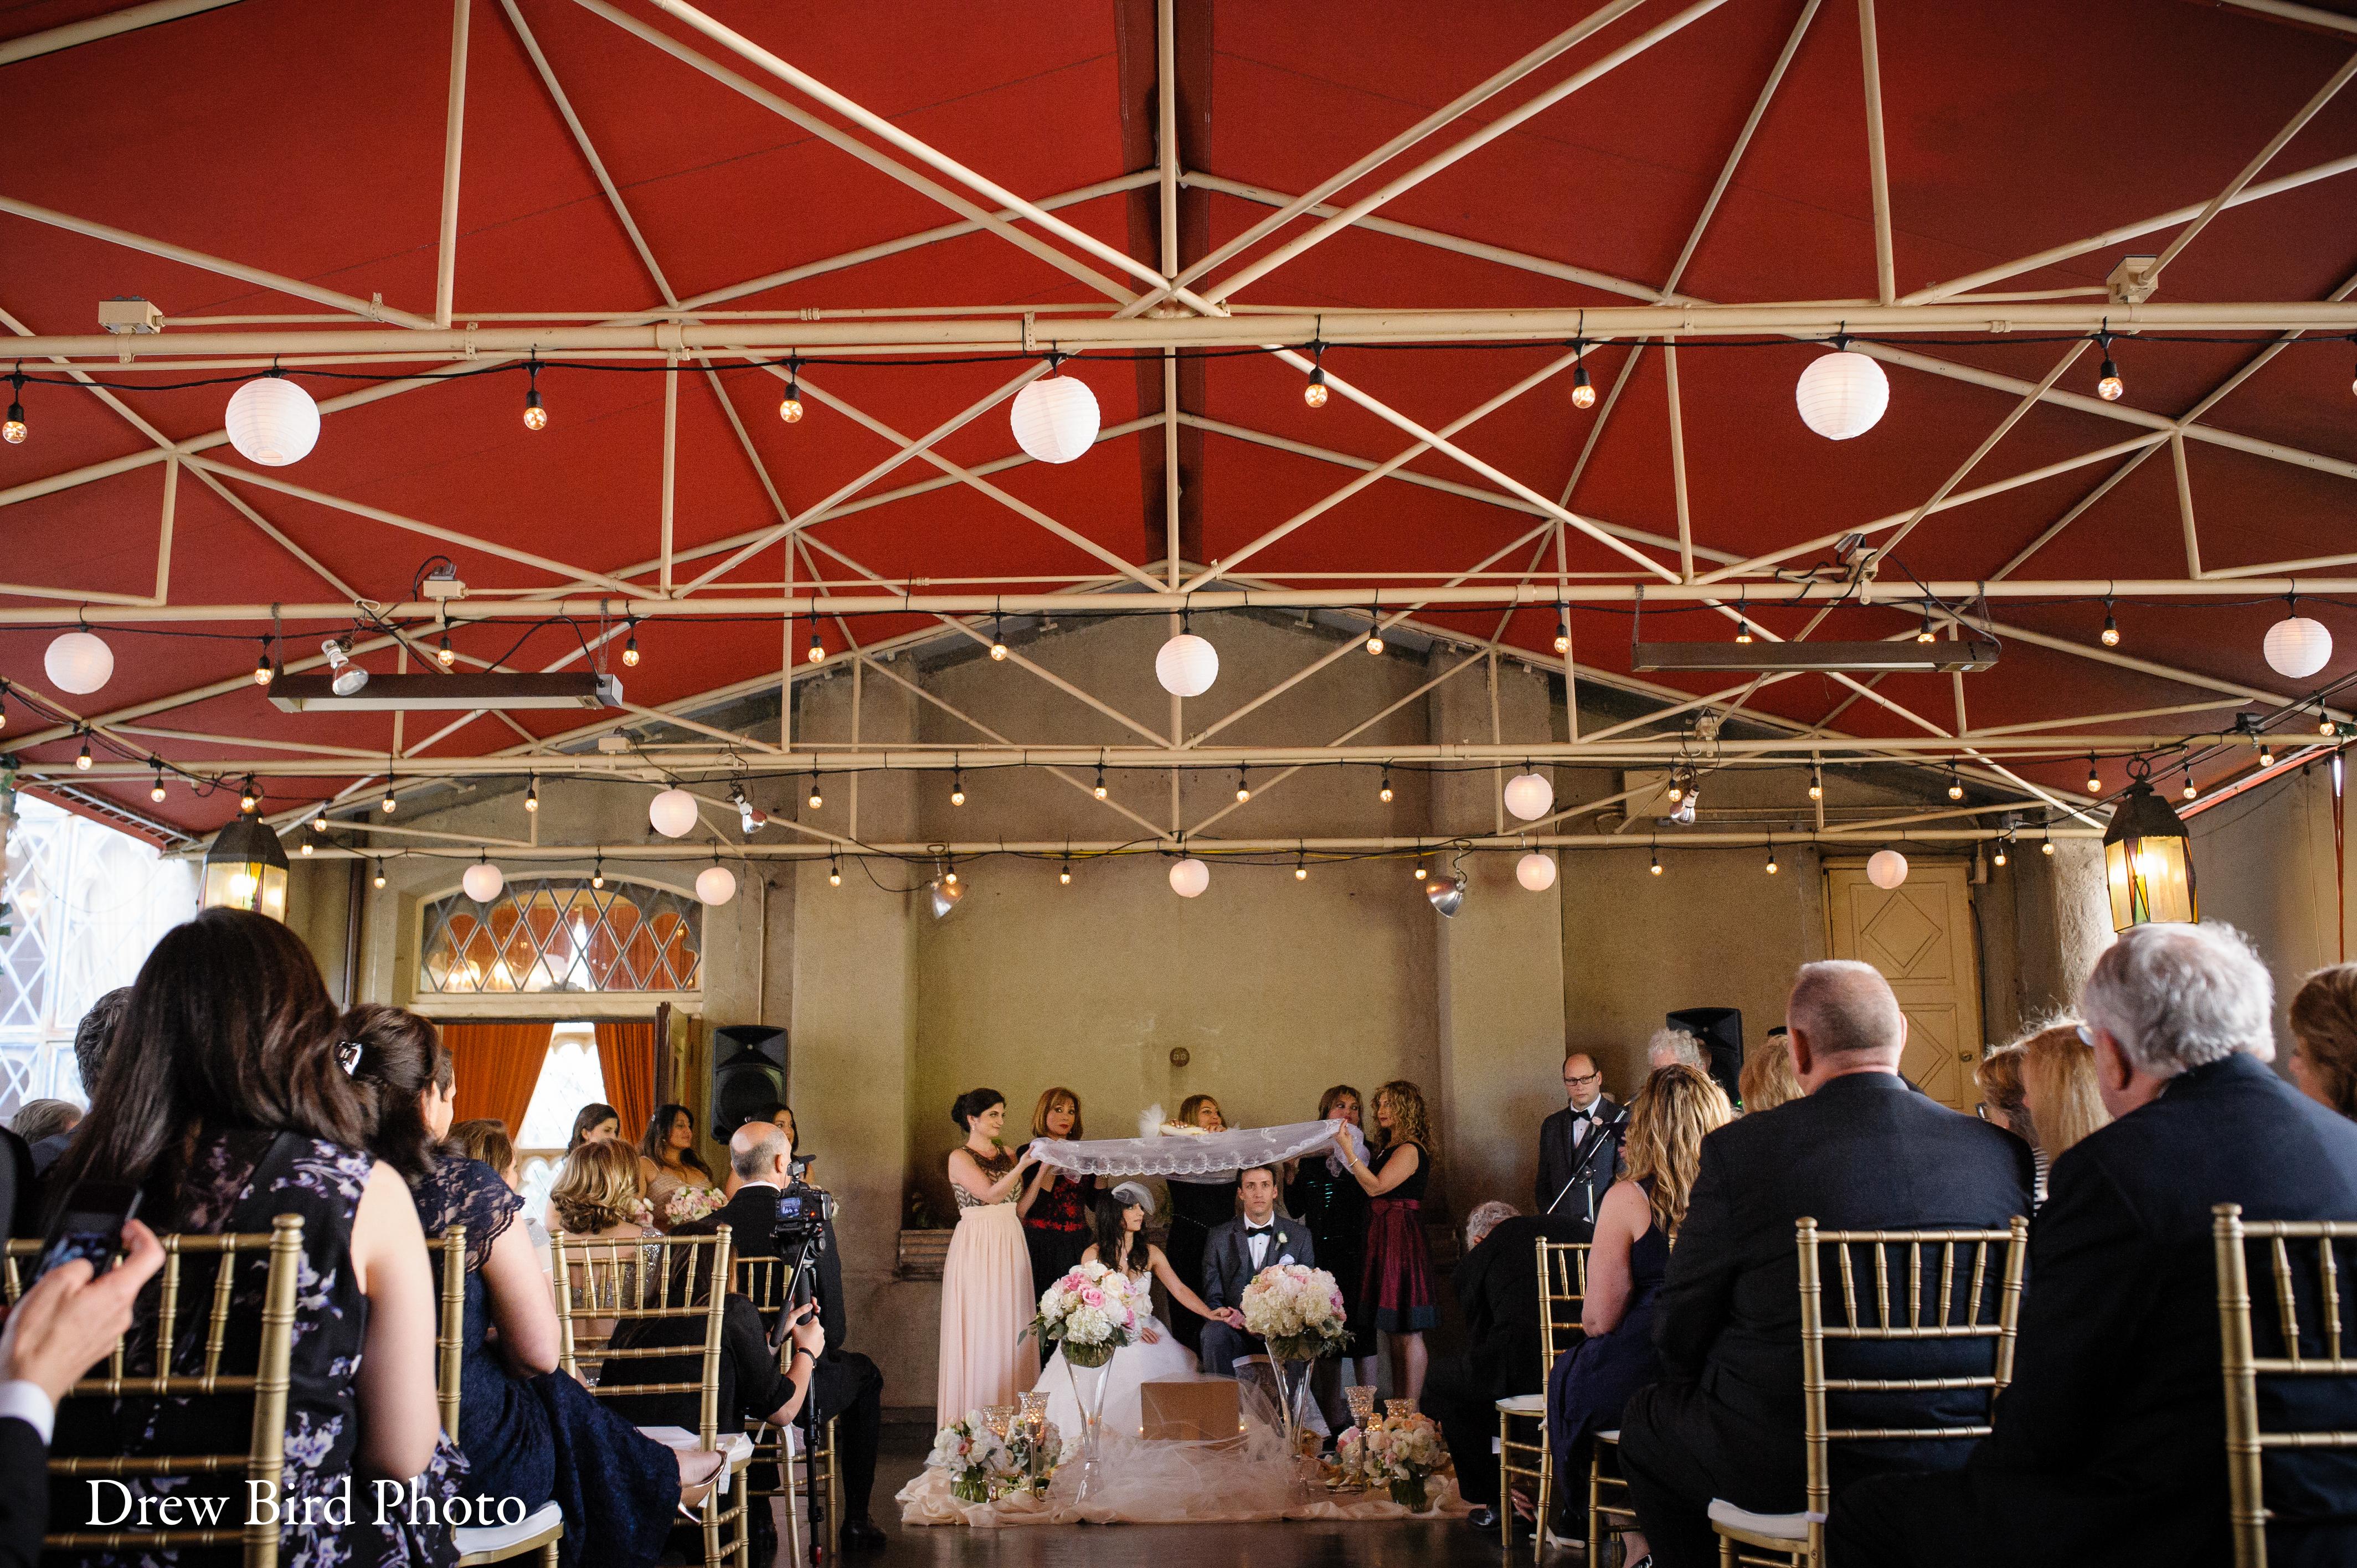 Drew Bird Photography | San Francisco Bay Area Wedding Photographer | Oakland Visual Storyteller | San Francisco Wedding Photojournalist | Berkeley City Club Wedding